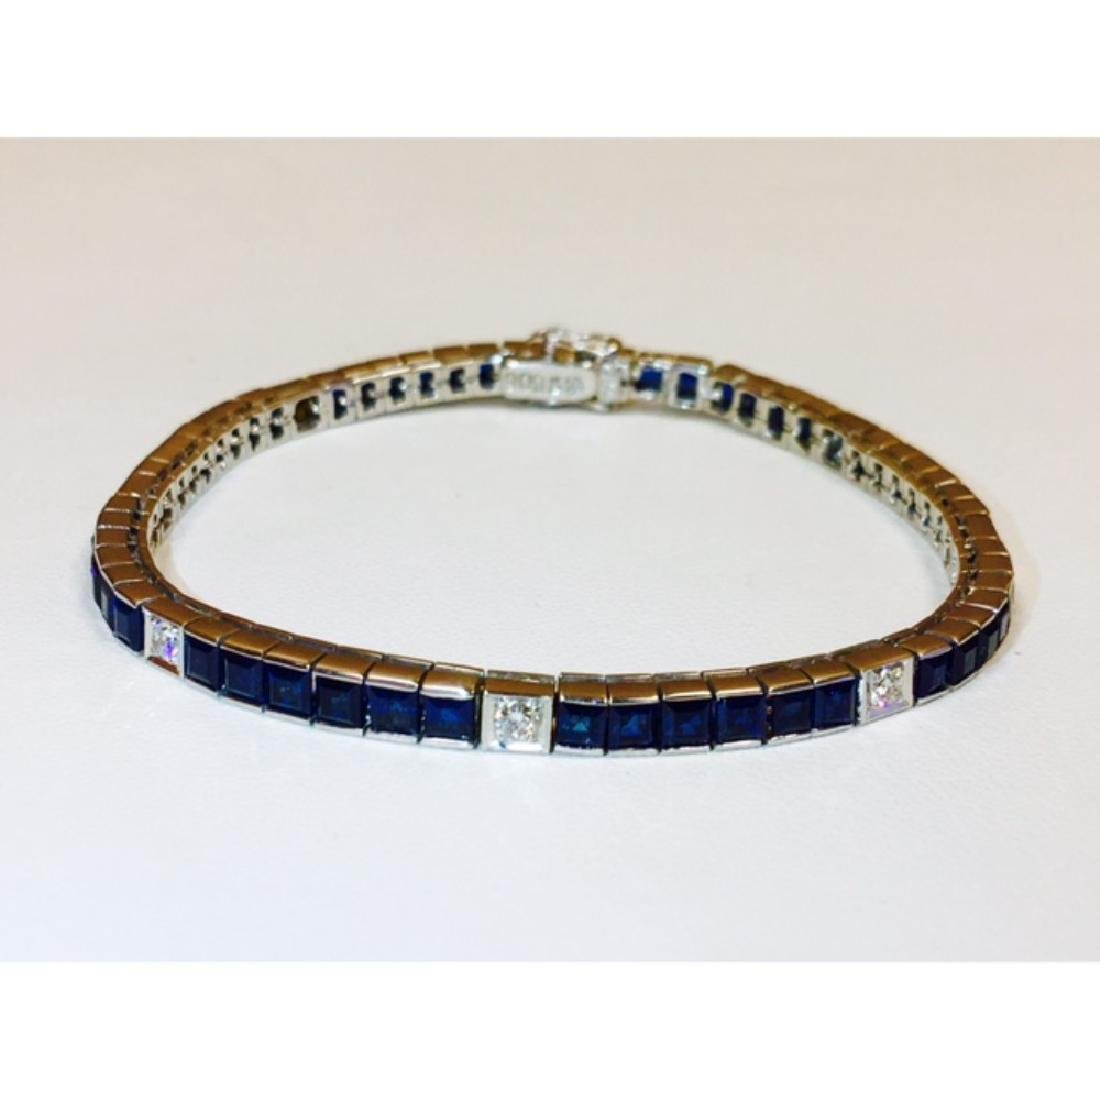 18K, 4.00 Carat Blue Sapphire and Diamond Bracelet - 3